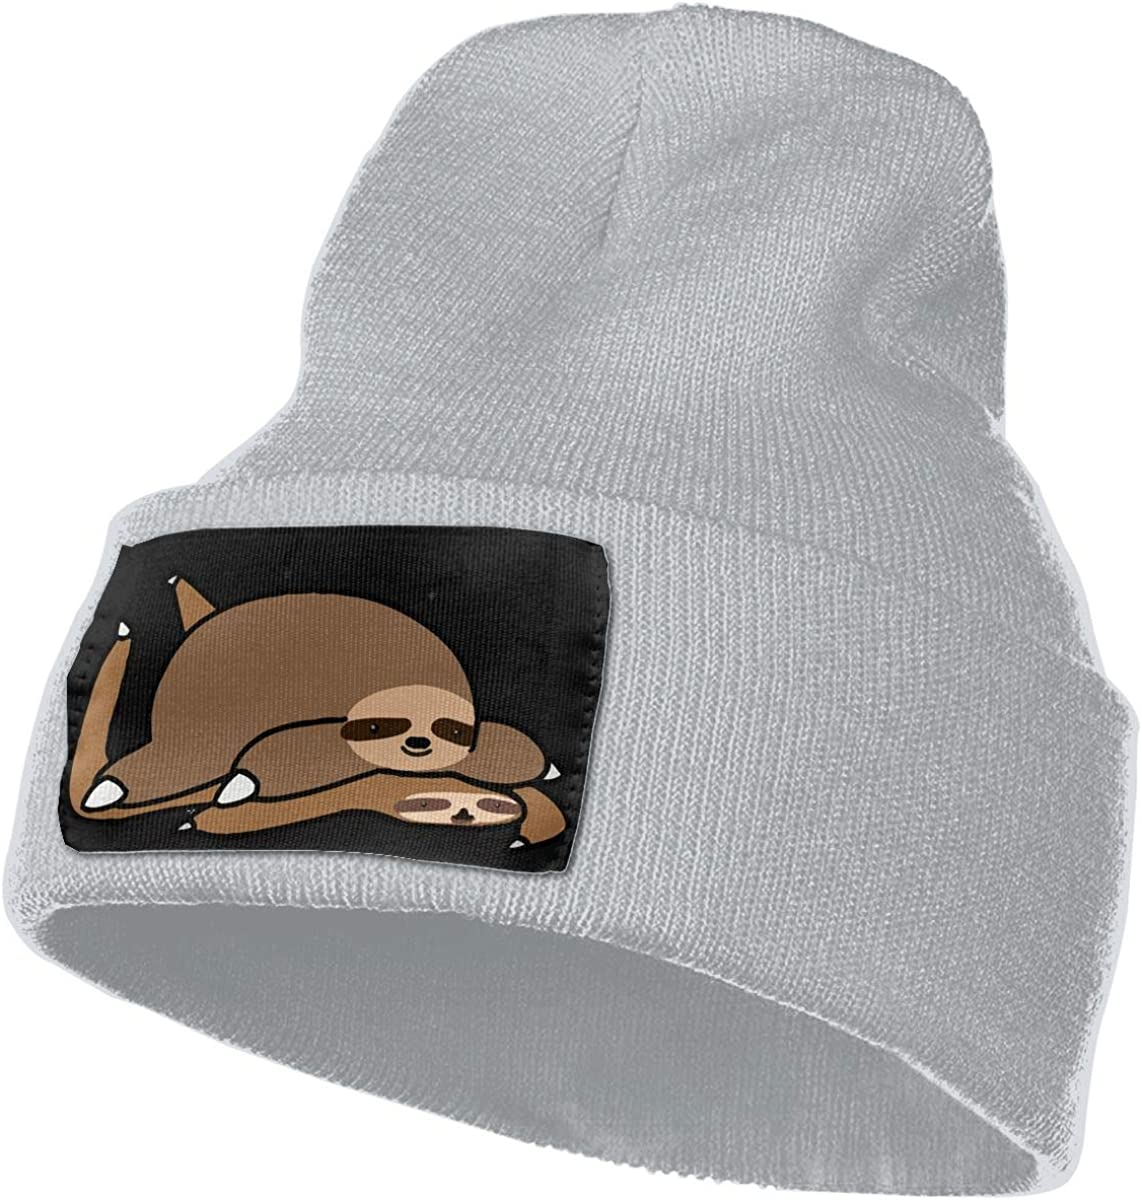 Fat Sloth Men /& Women Knitting Hats Stretchy /& Soft Ski Cap Beanie